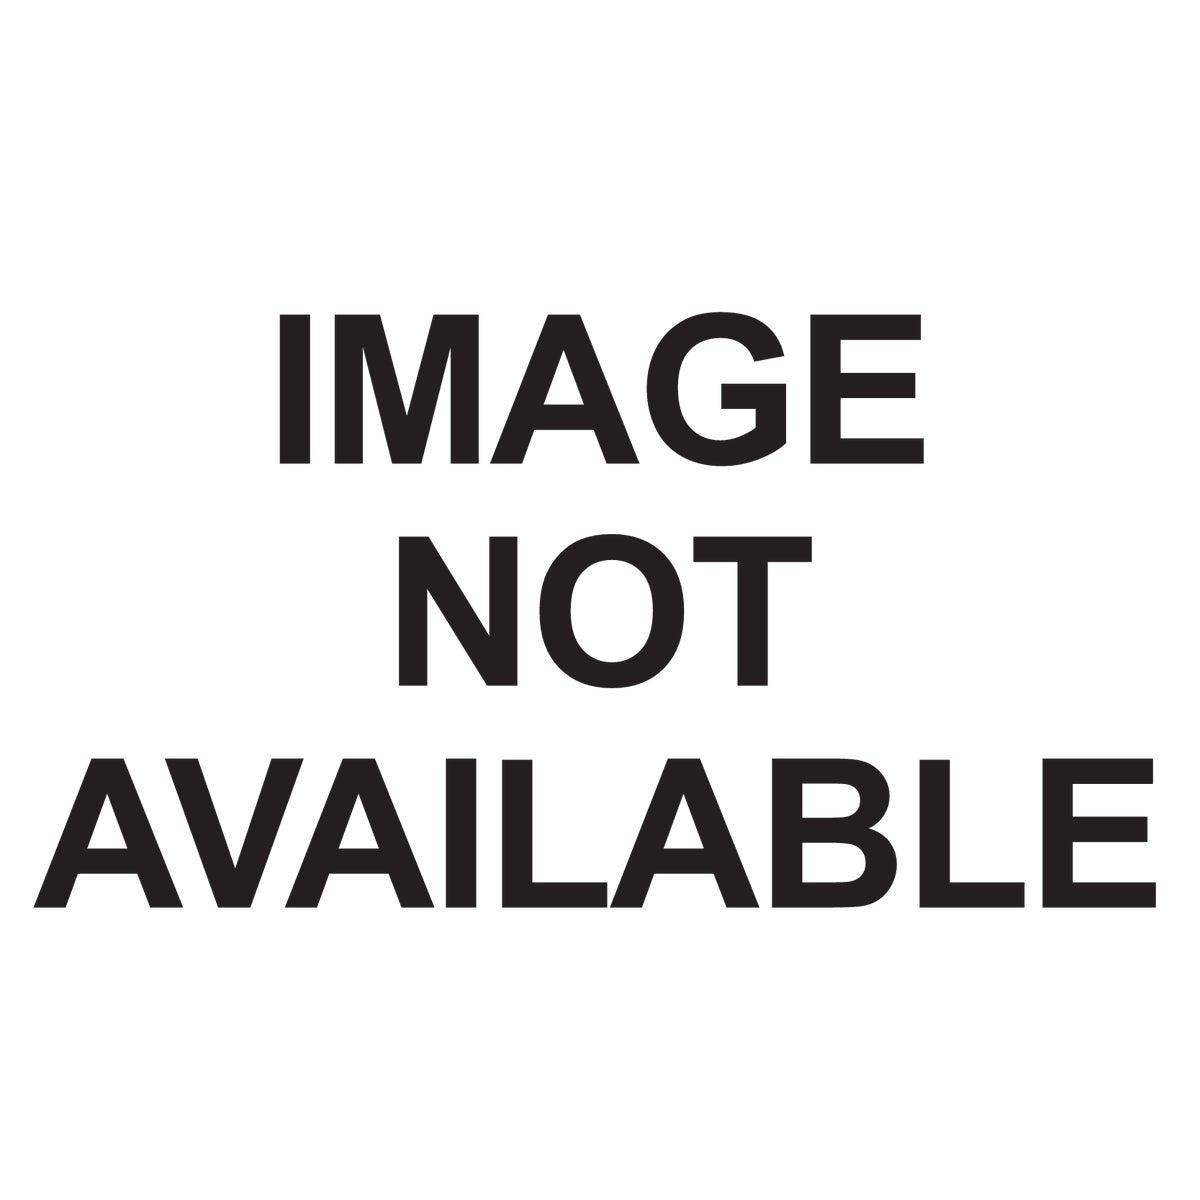 BIRCH BARK CARPET TILE - 545029-915 by Milliken And Company